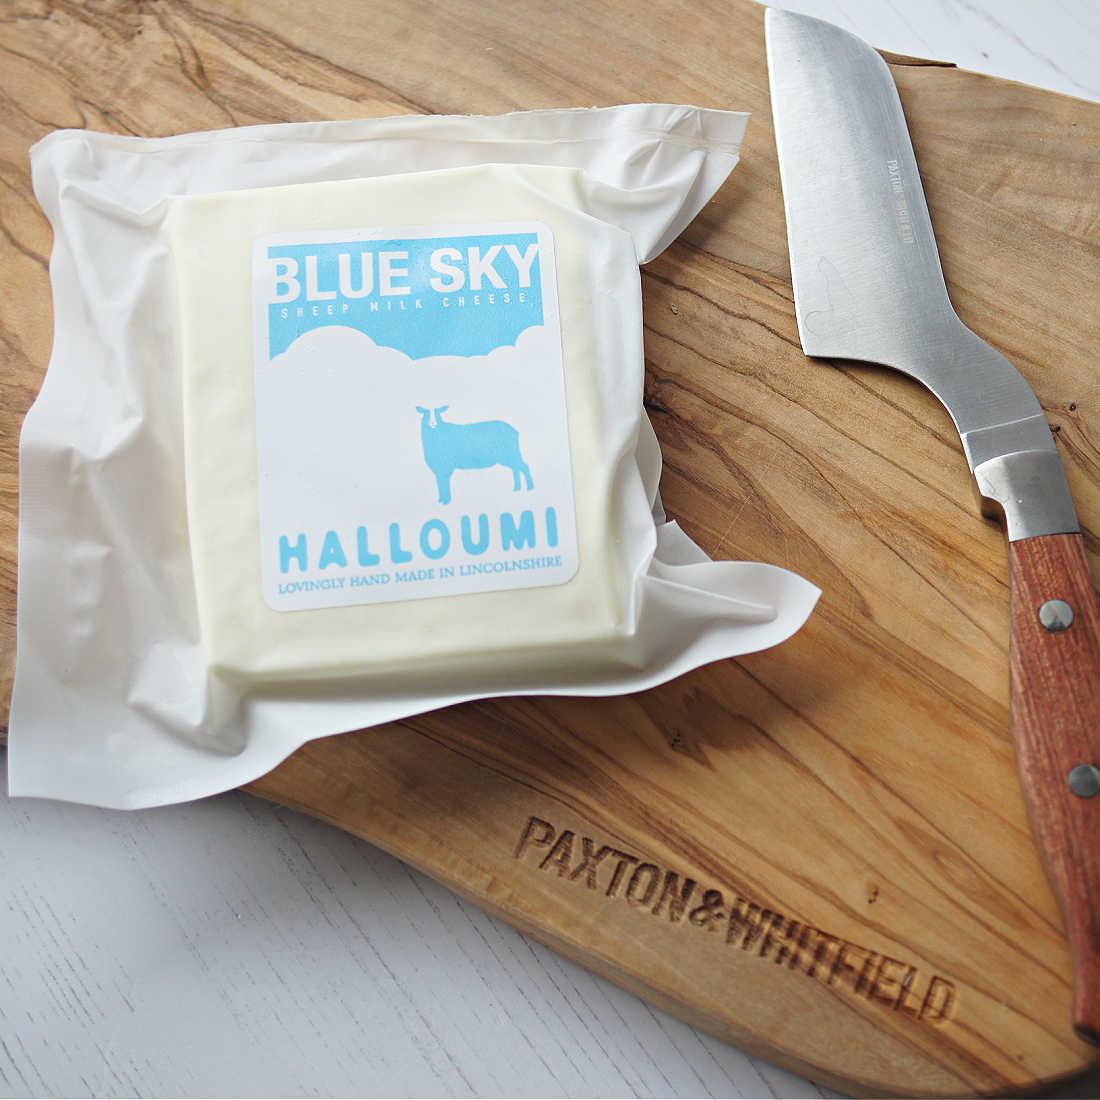 Blue-Sky-Halloumi-low-reso3qLS9xILn9EC